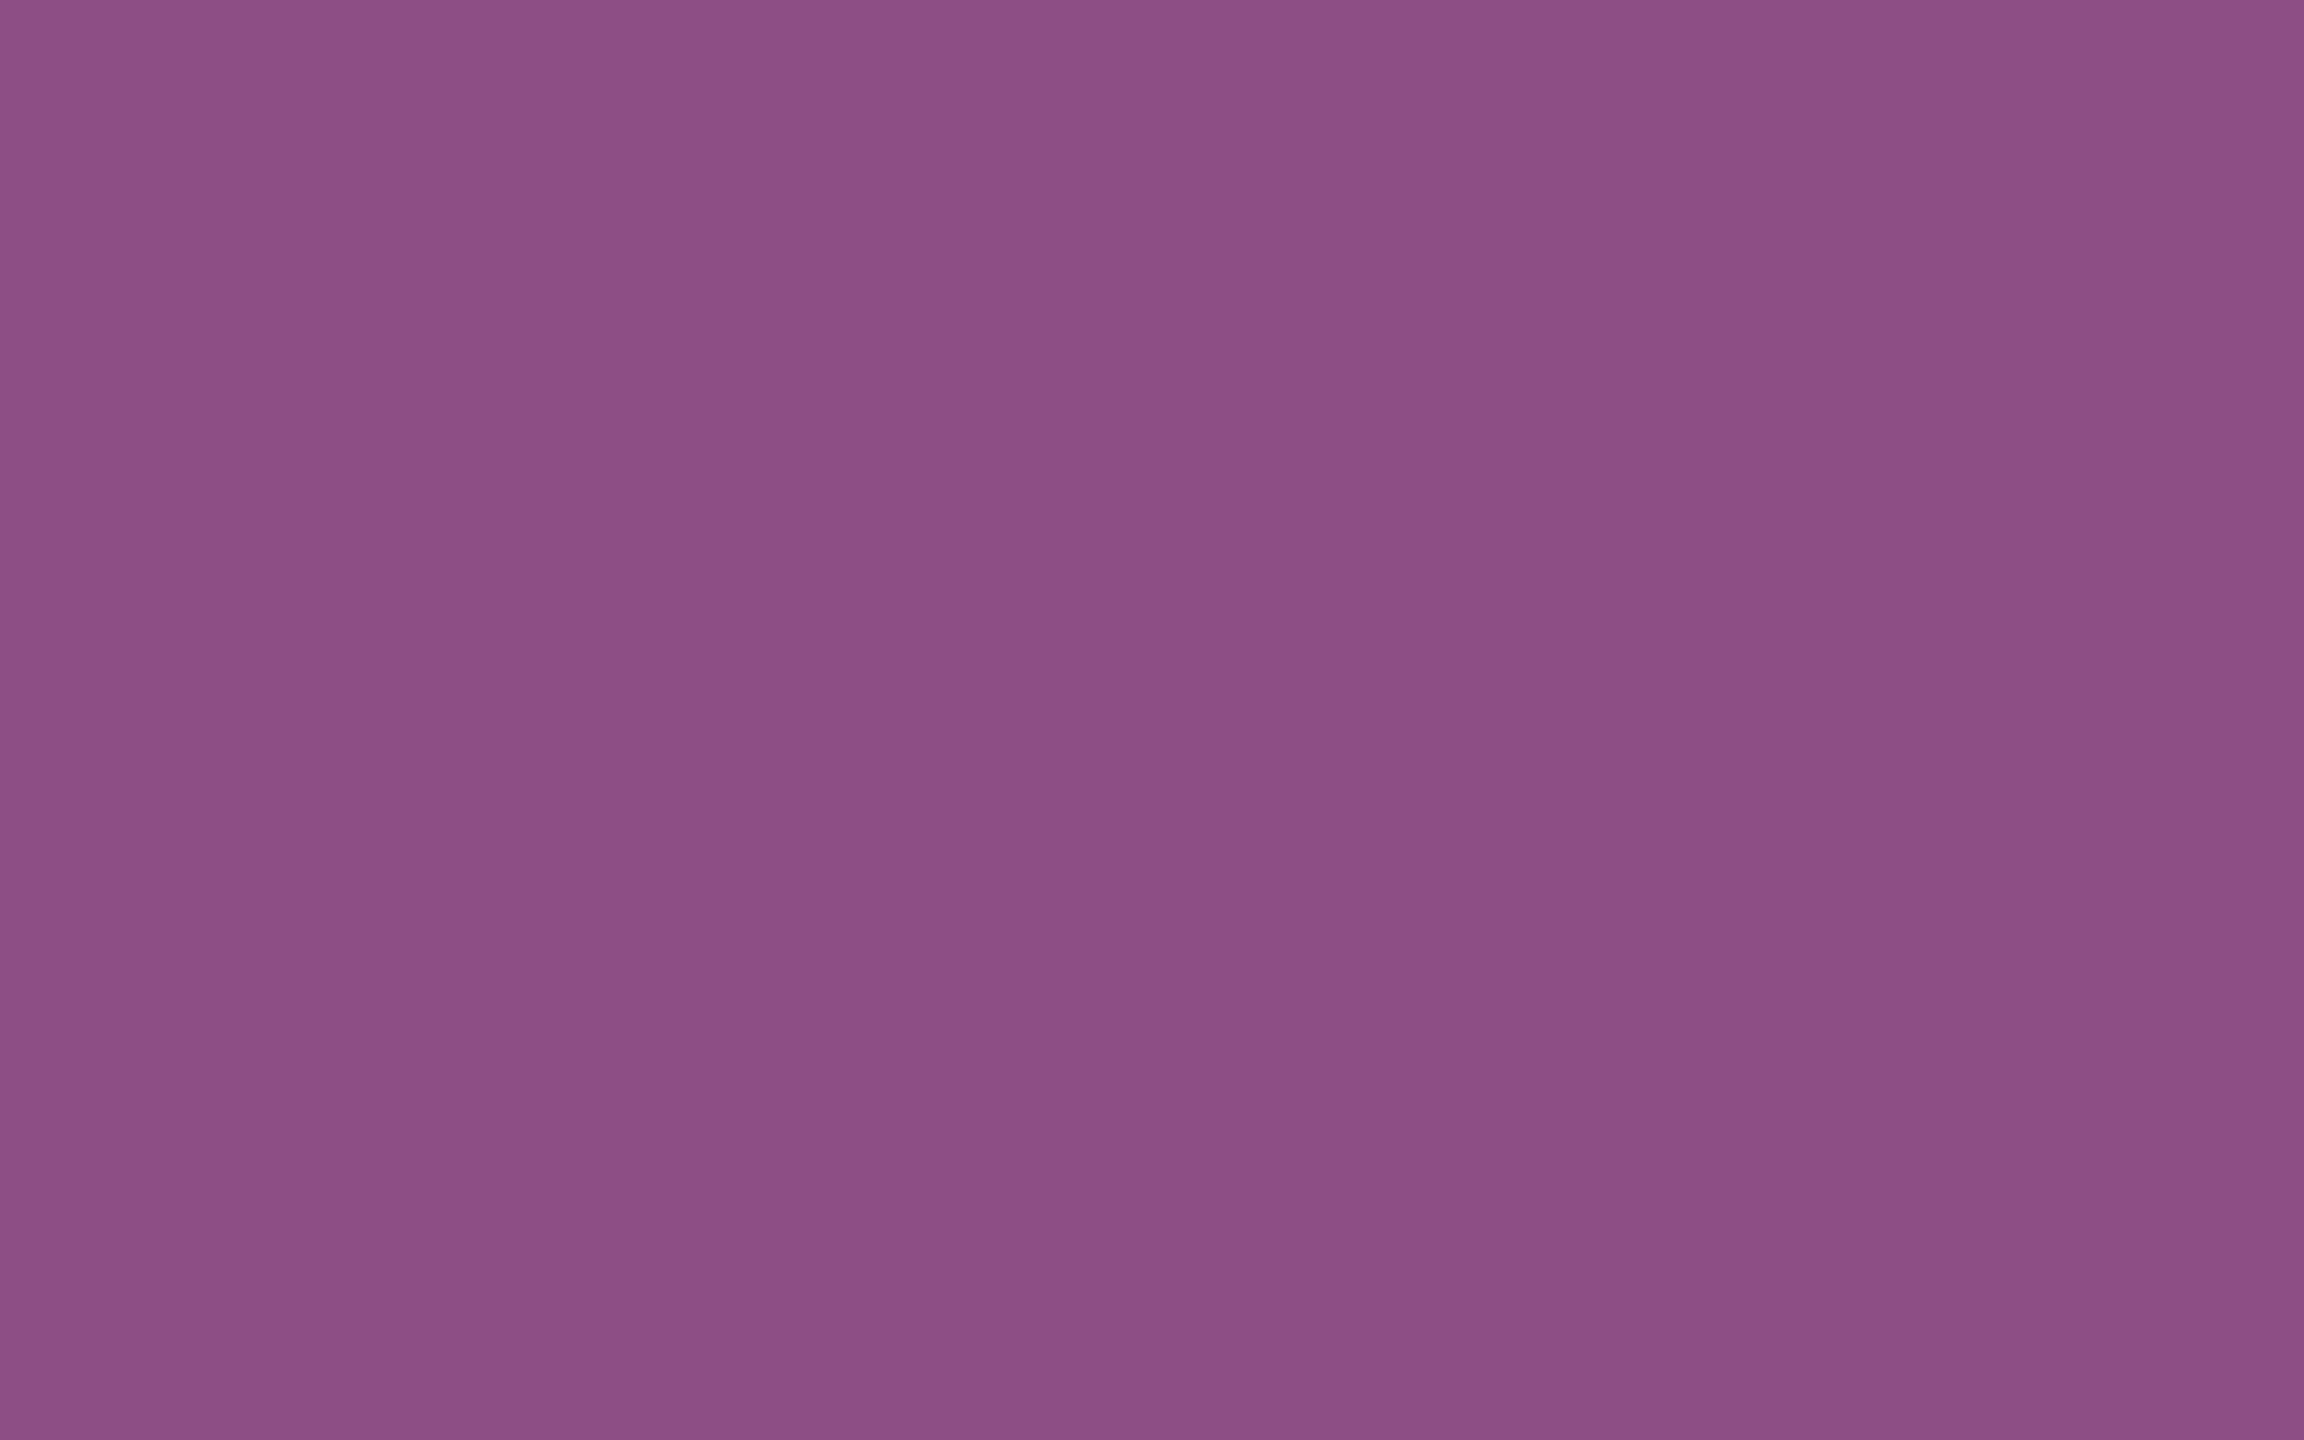 2304x1440 Razzmic Berry Solid Color Background